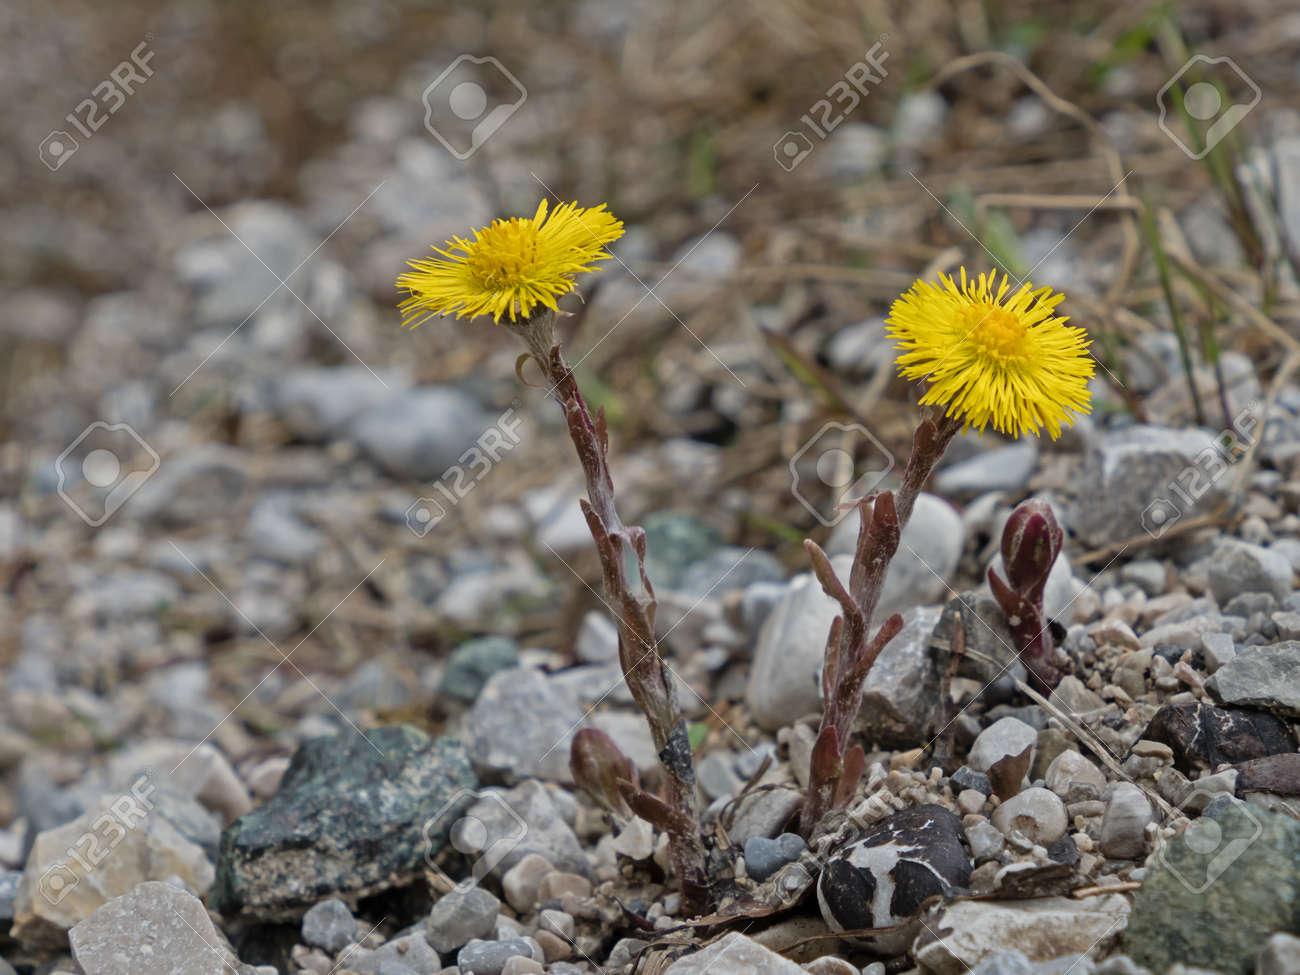 close-up of the blossoms of a coltsfoot, Tussilago farfara - 156533164